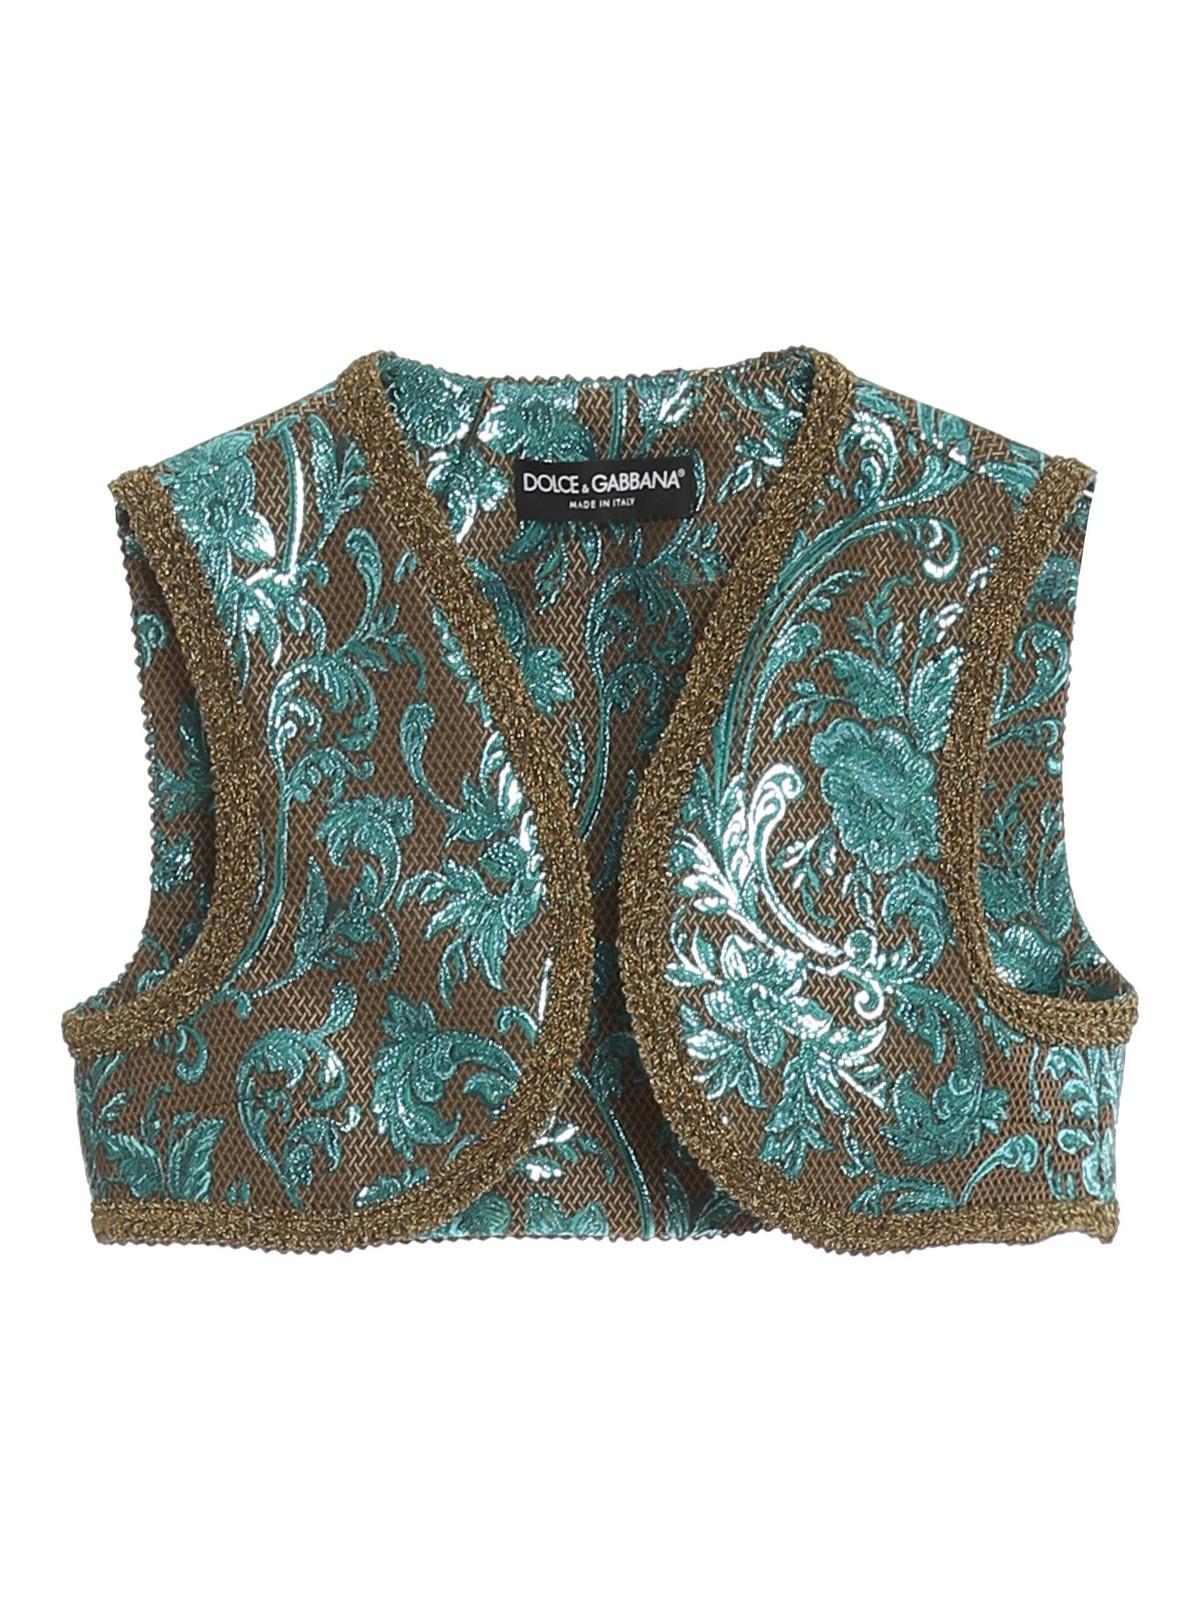 Dolce & Gabbana Jackets DAMASK CROPPED GILET